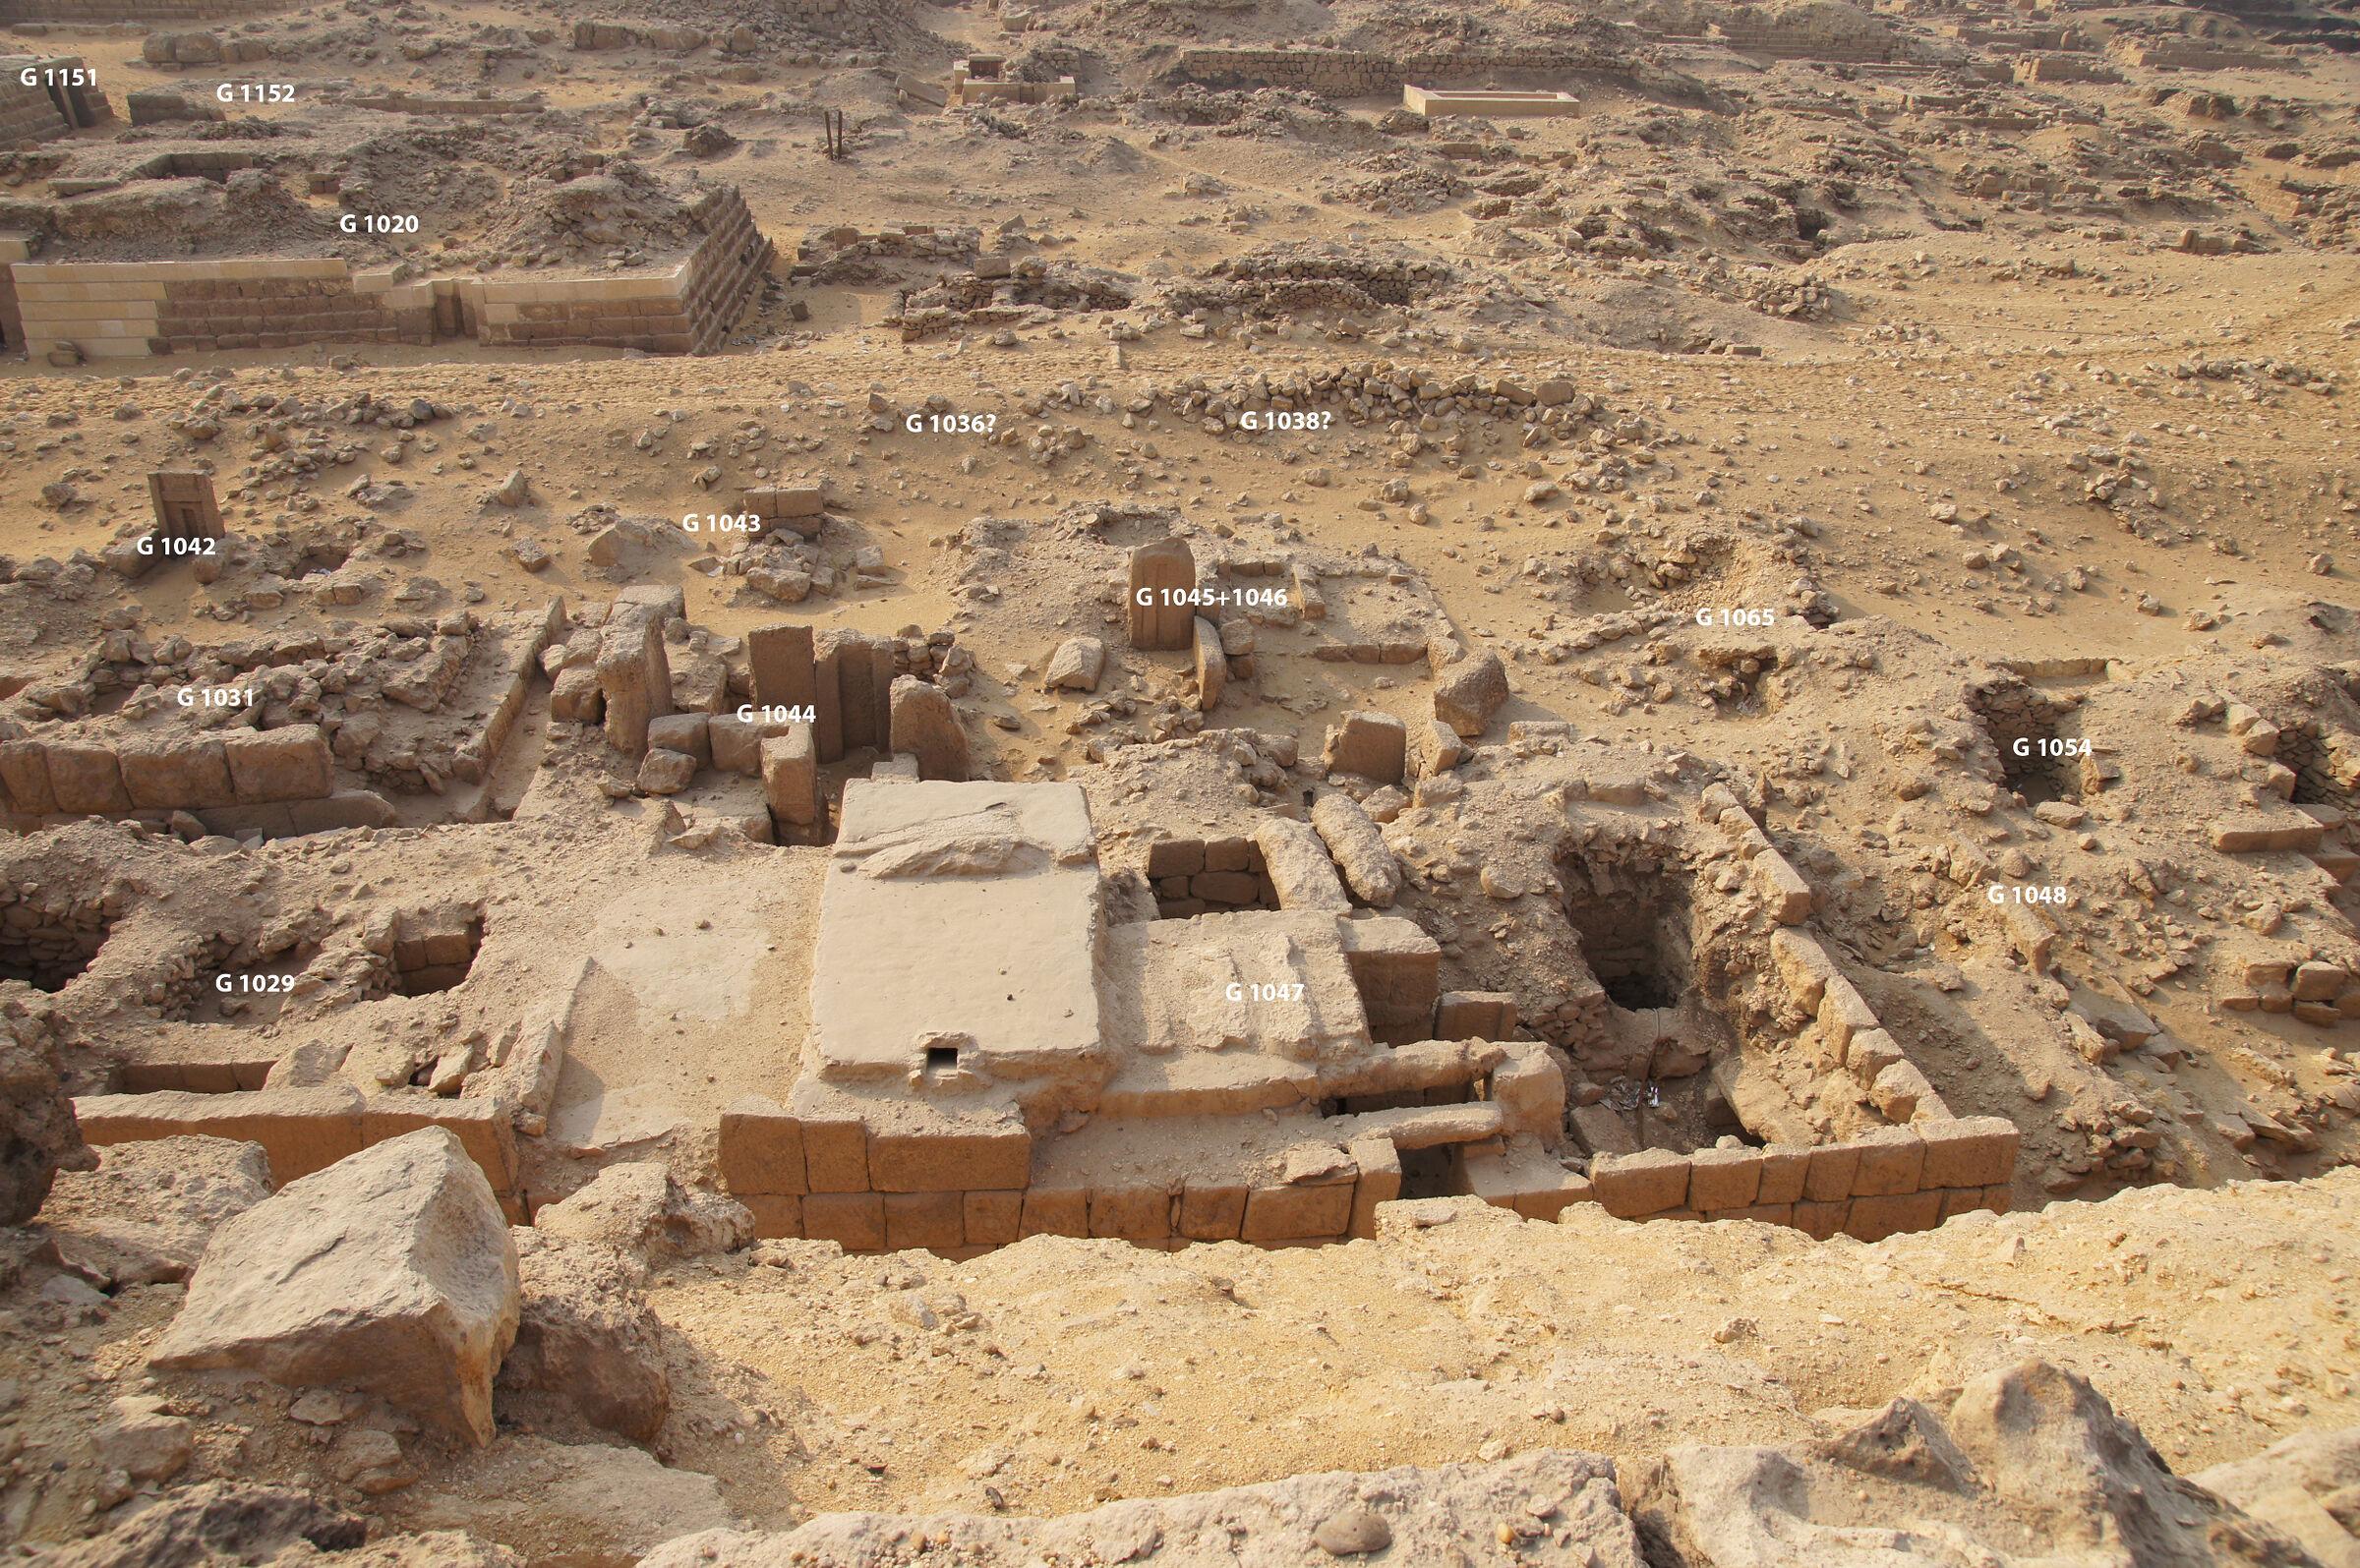 Western Cemetery: Site: Giza; View: G 1029, G 1047, G 1048, G 1031, G 1044, G 1045+1046, G 1065, G 1054, G 1042, G 1043, G 1036, G 1038, G 1020, G 1151, G 1152